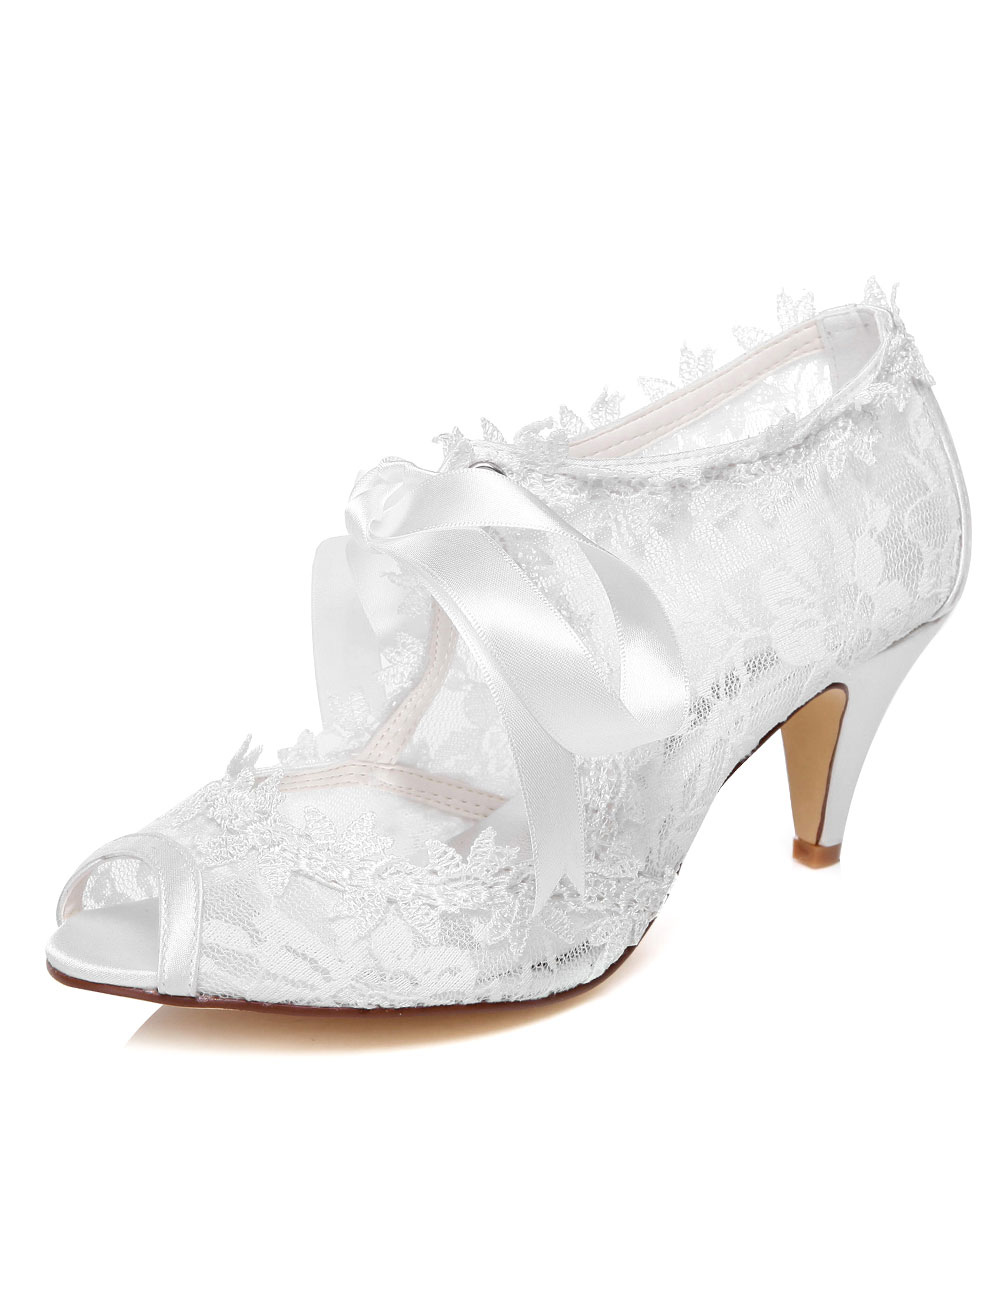 White Lace Ribbons Peep Toe Bridal Pumps for Women